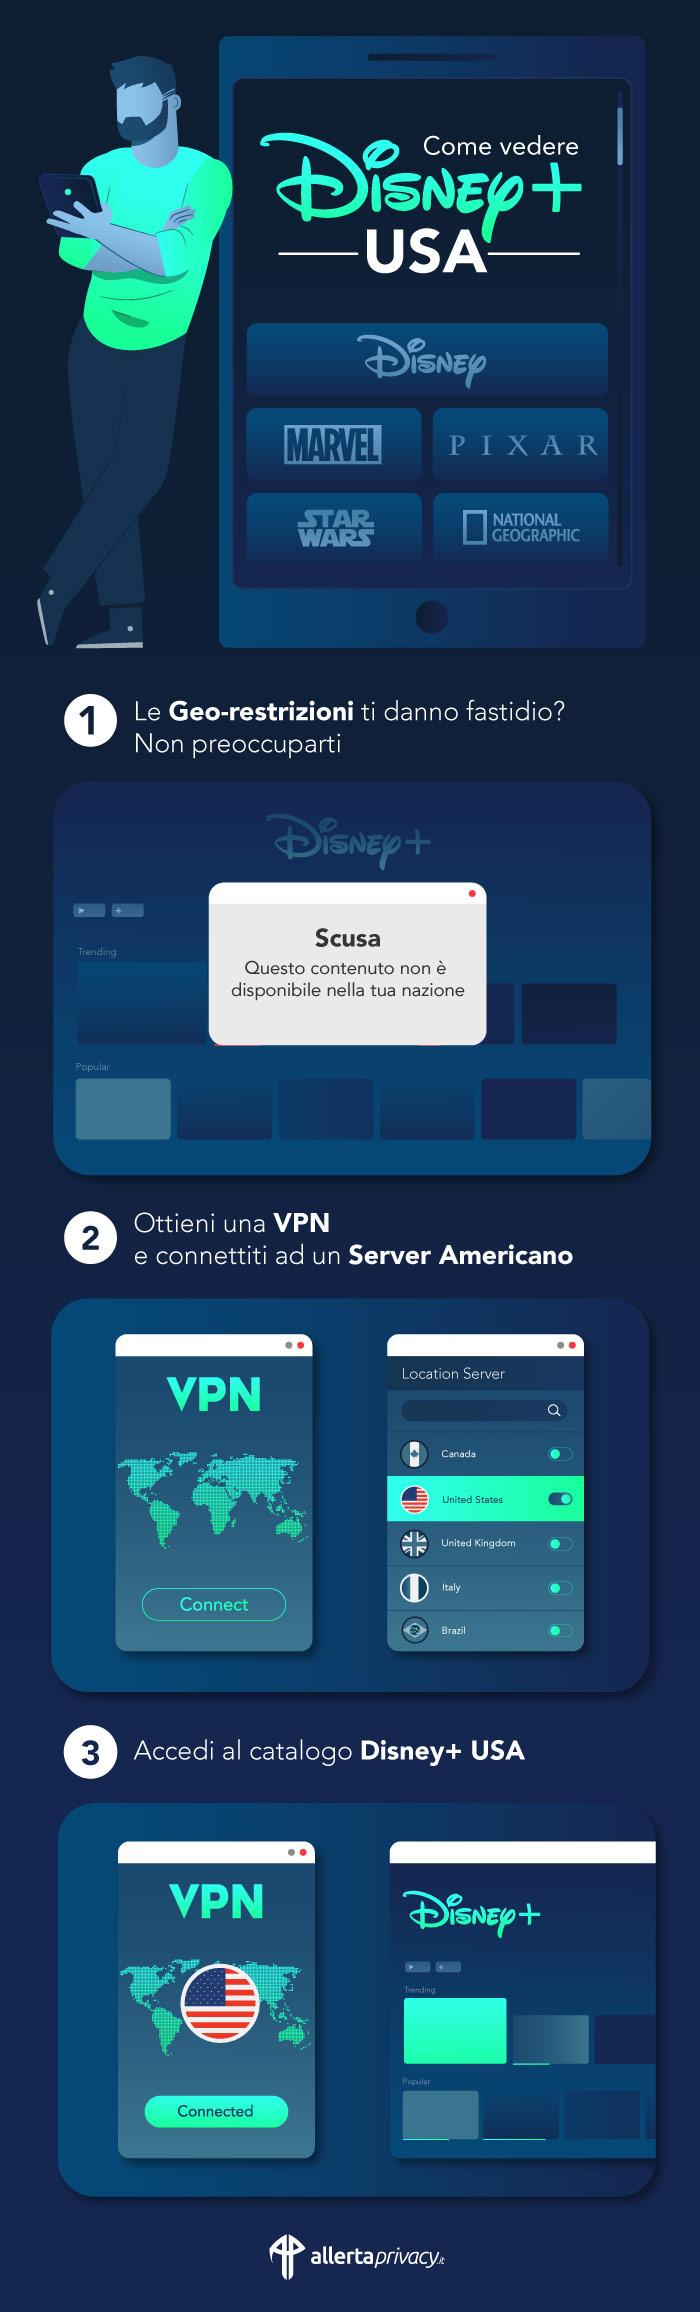 disneyplus usa infographic